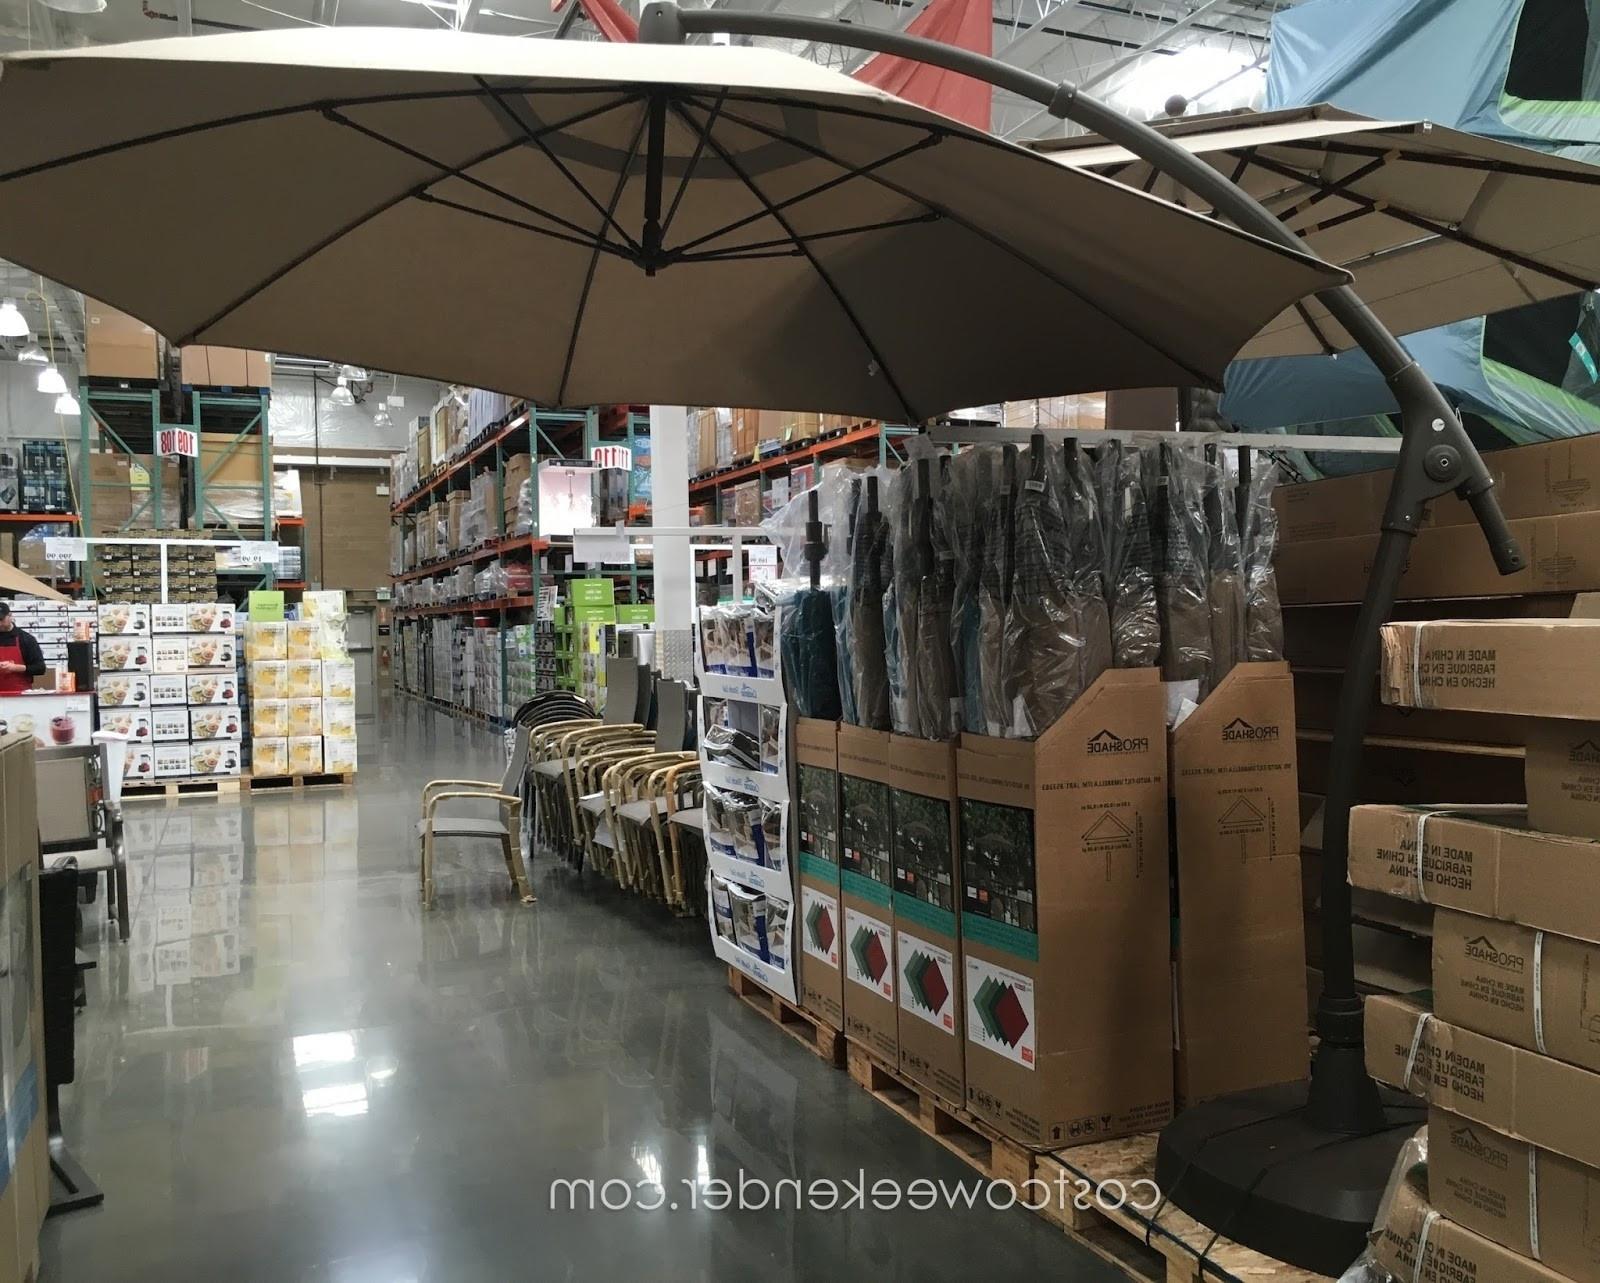 Most Current Sunbrella Patio Umbrellas At Costco Pertaining To 11 Cantilever Patio Umbrella With Base Treasure Garden Cantilever (View 6 of 20)